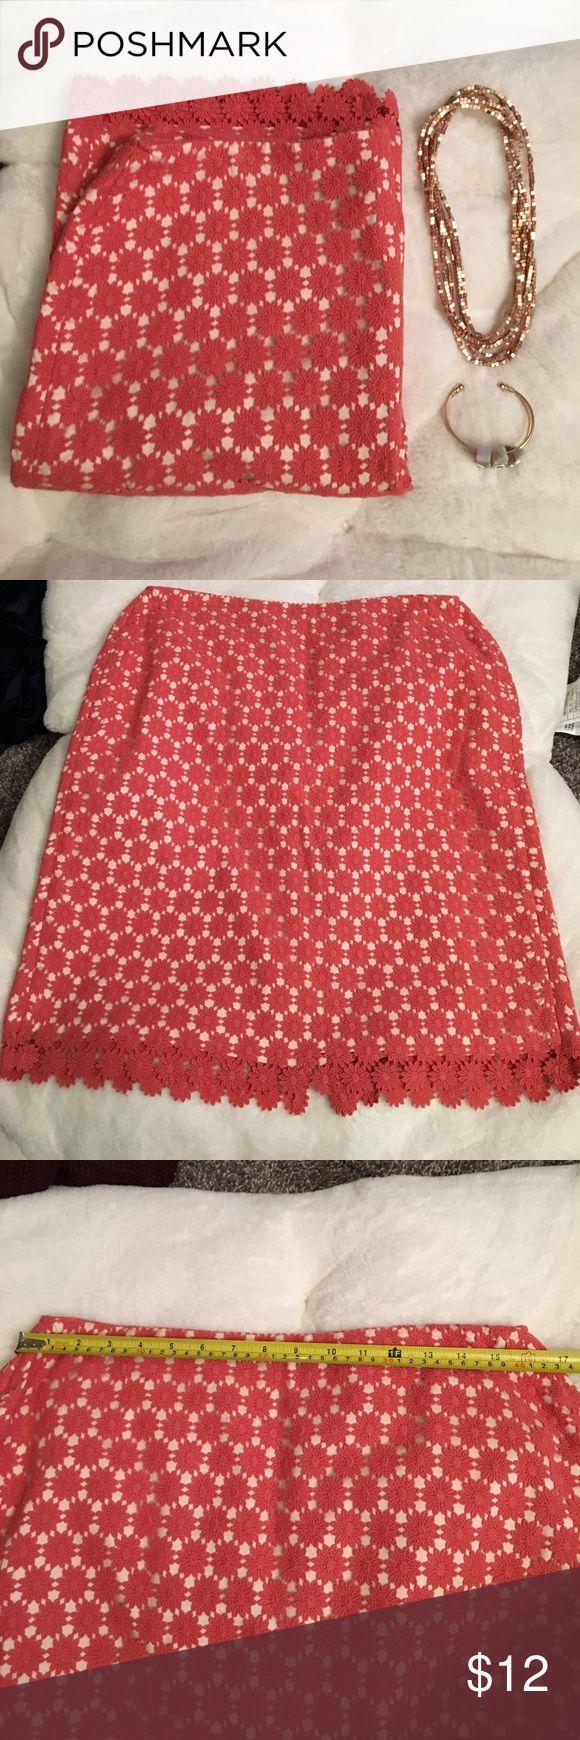 Talbots brand crochet skirt Talbots brand dress with crochet detailing around the skirt. Zip up closure up the back. 72% cotton, 28% lyocell Talbots Skirts